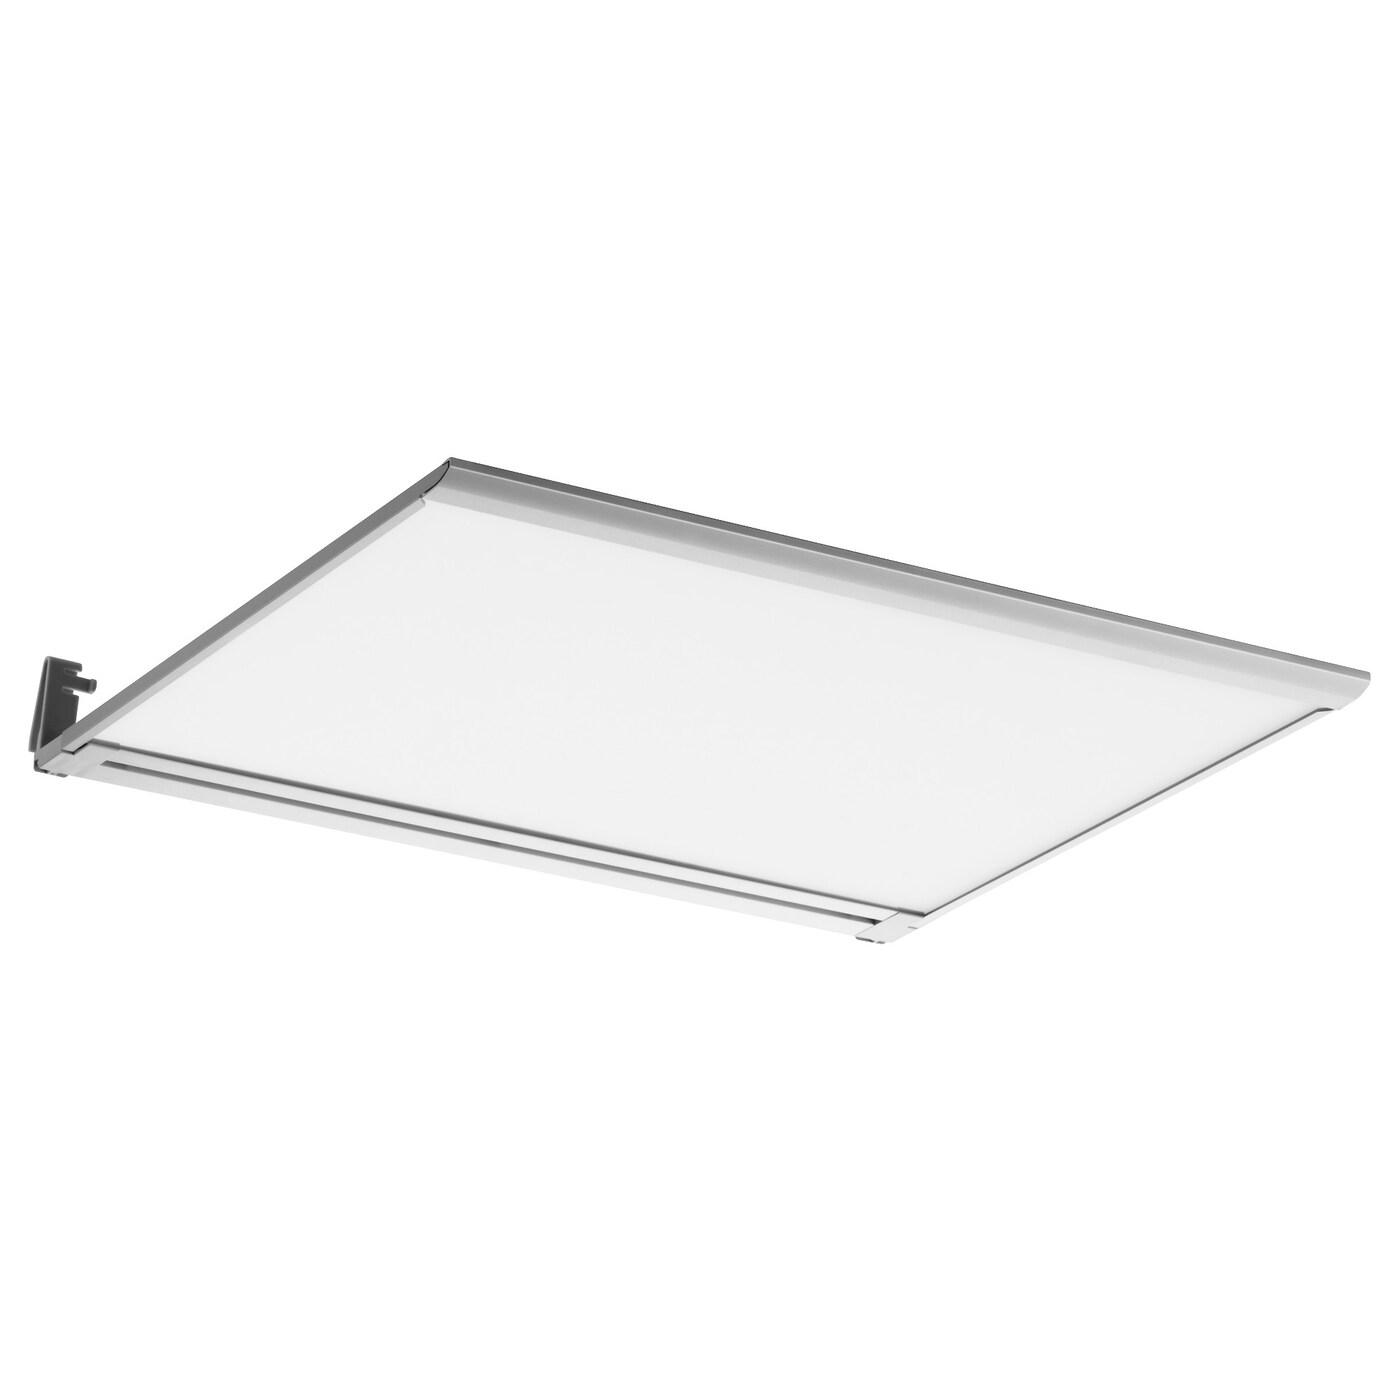 Irsta Eclairage Plan Travail A Led Opalin 40 Cm Ikea